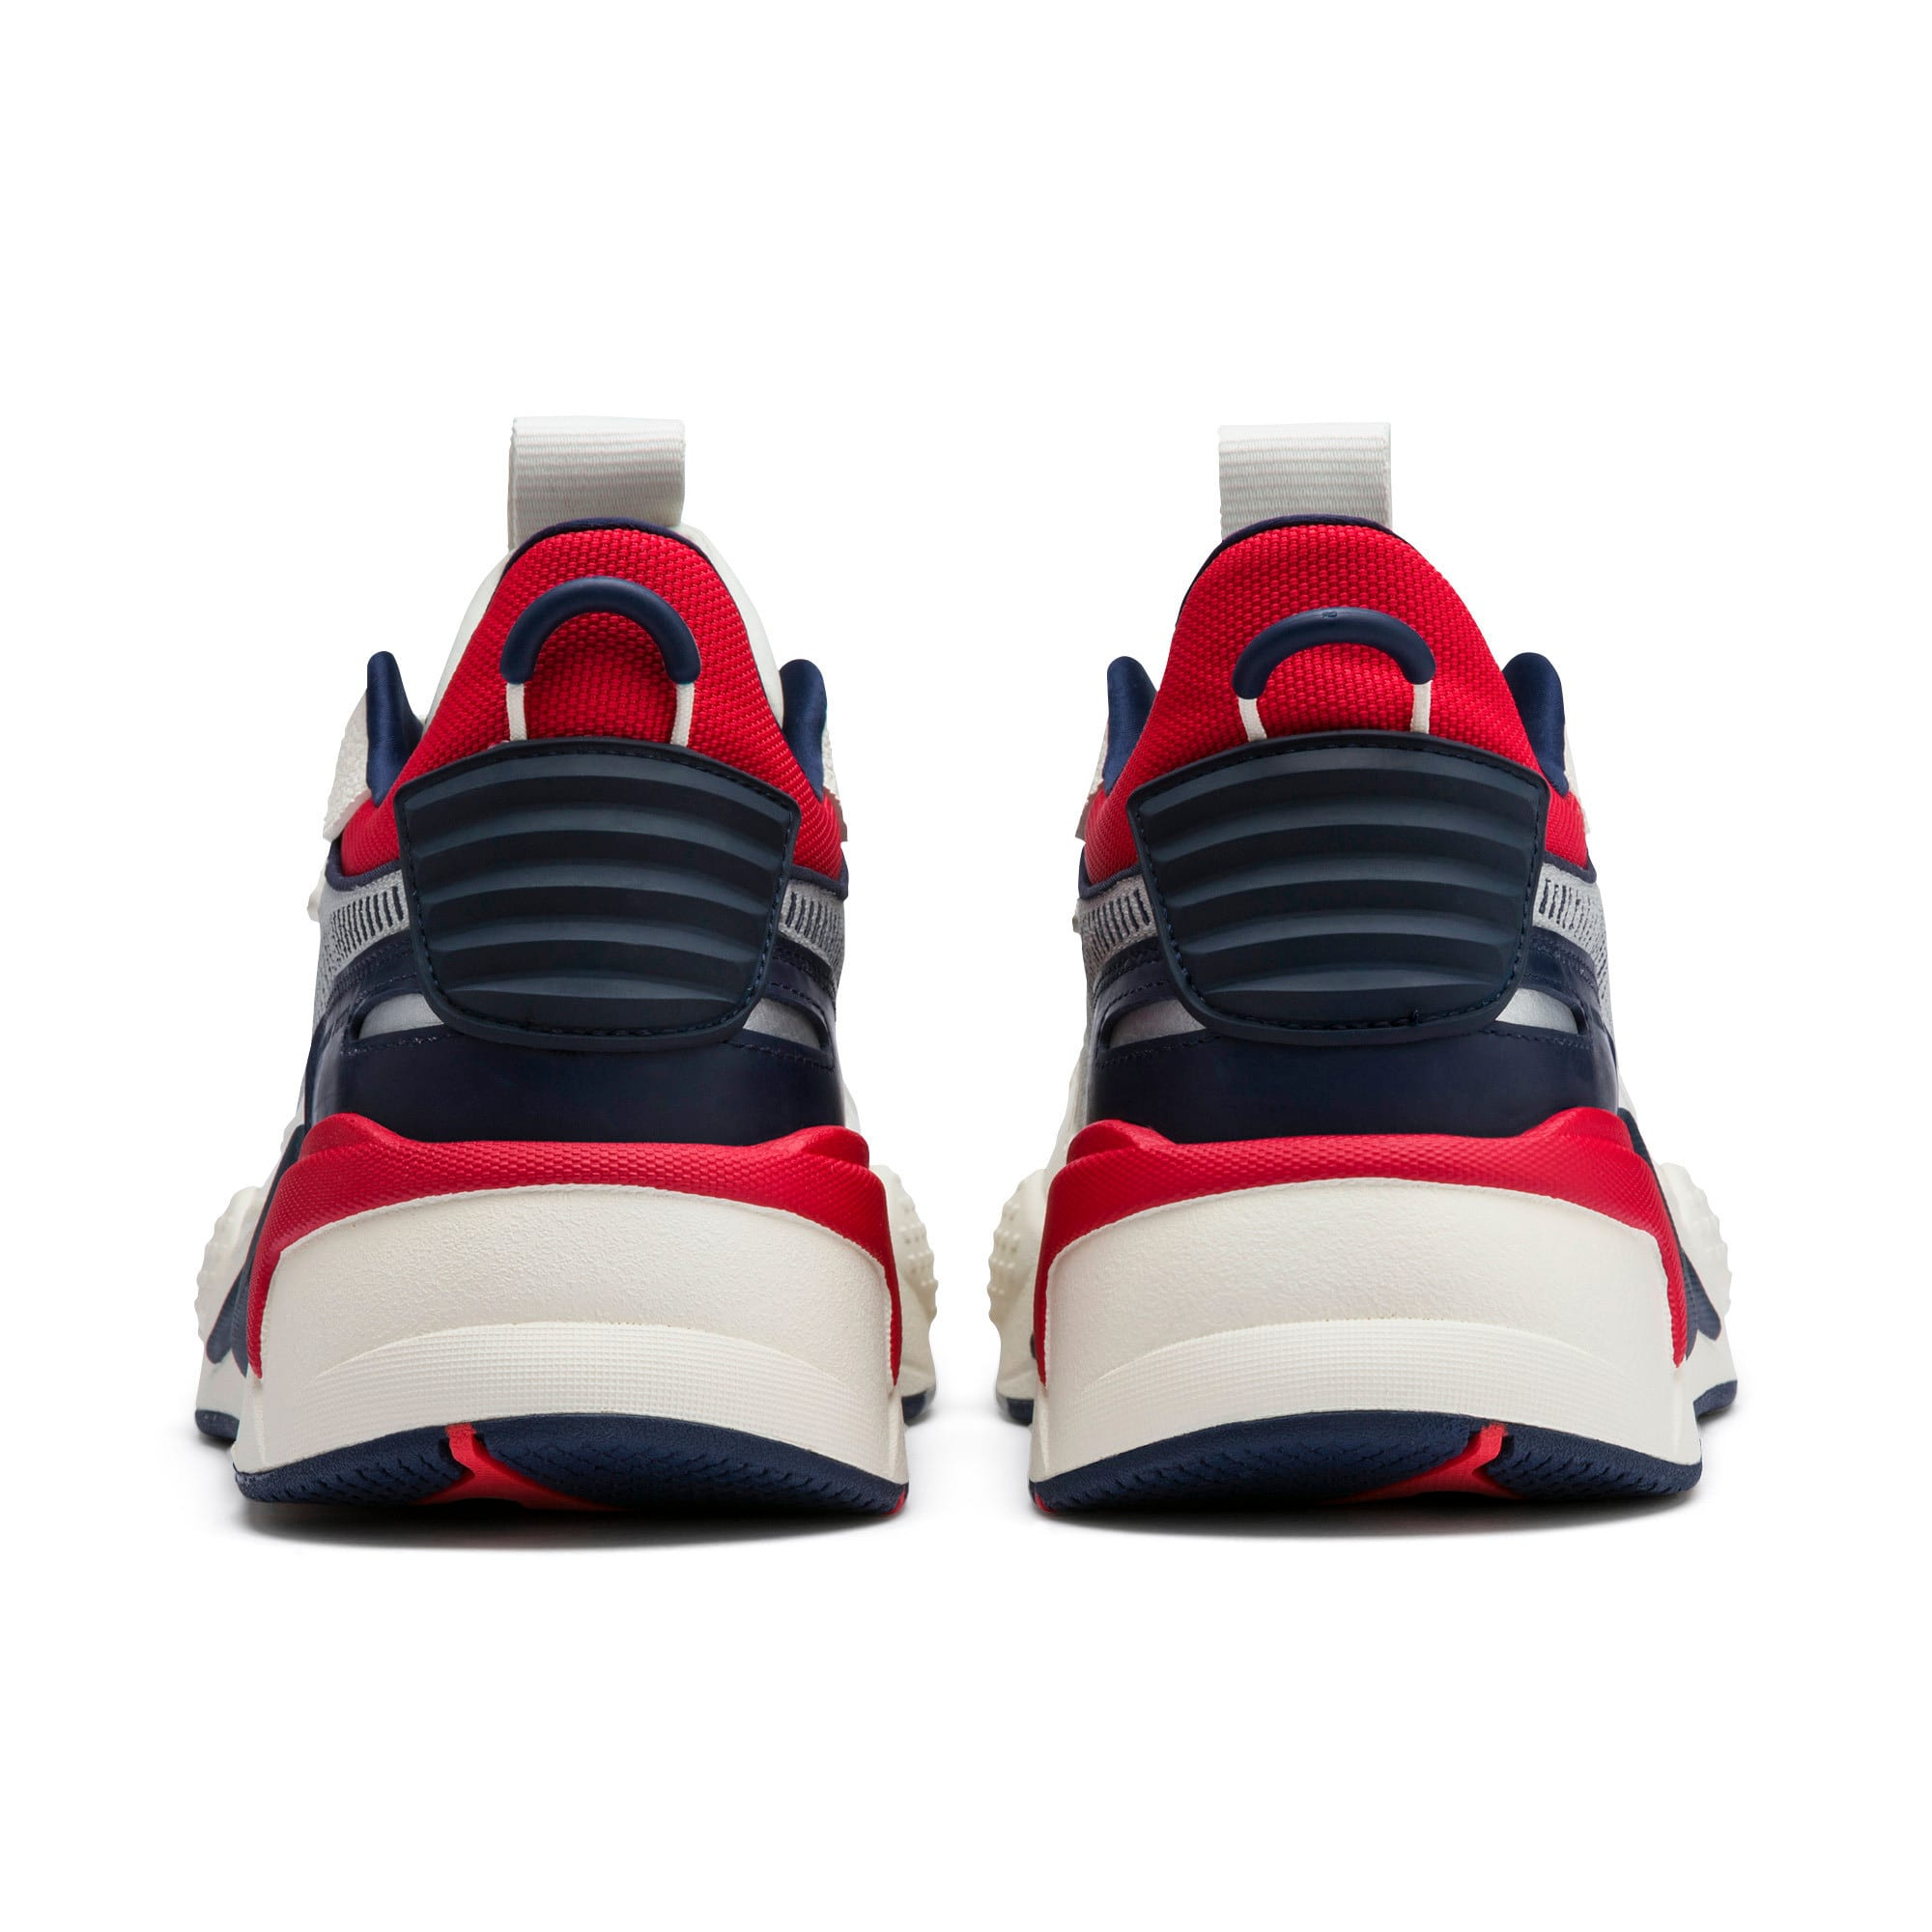 Thumbnail 4 of RS-X Hard Drive Sneakers, Whisper White-Peacoat, medium